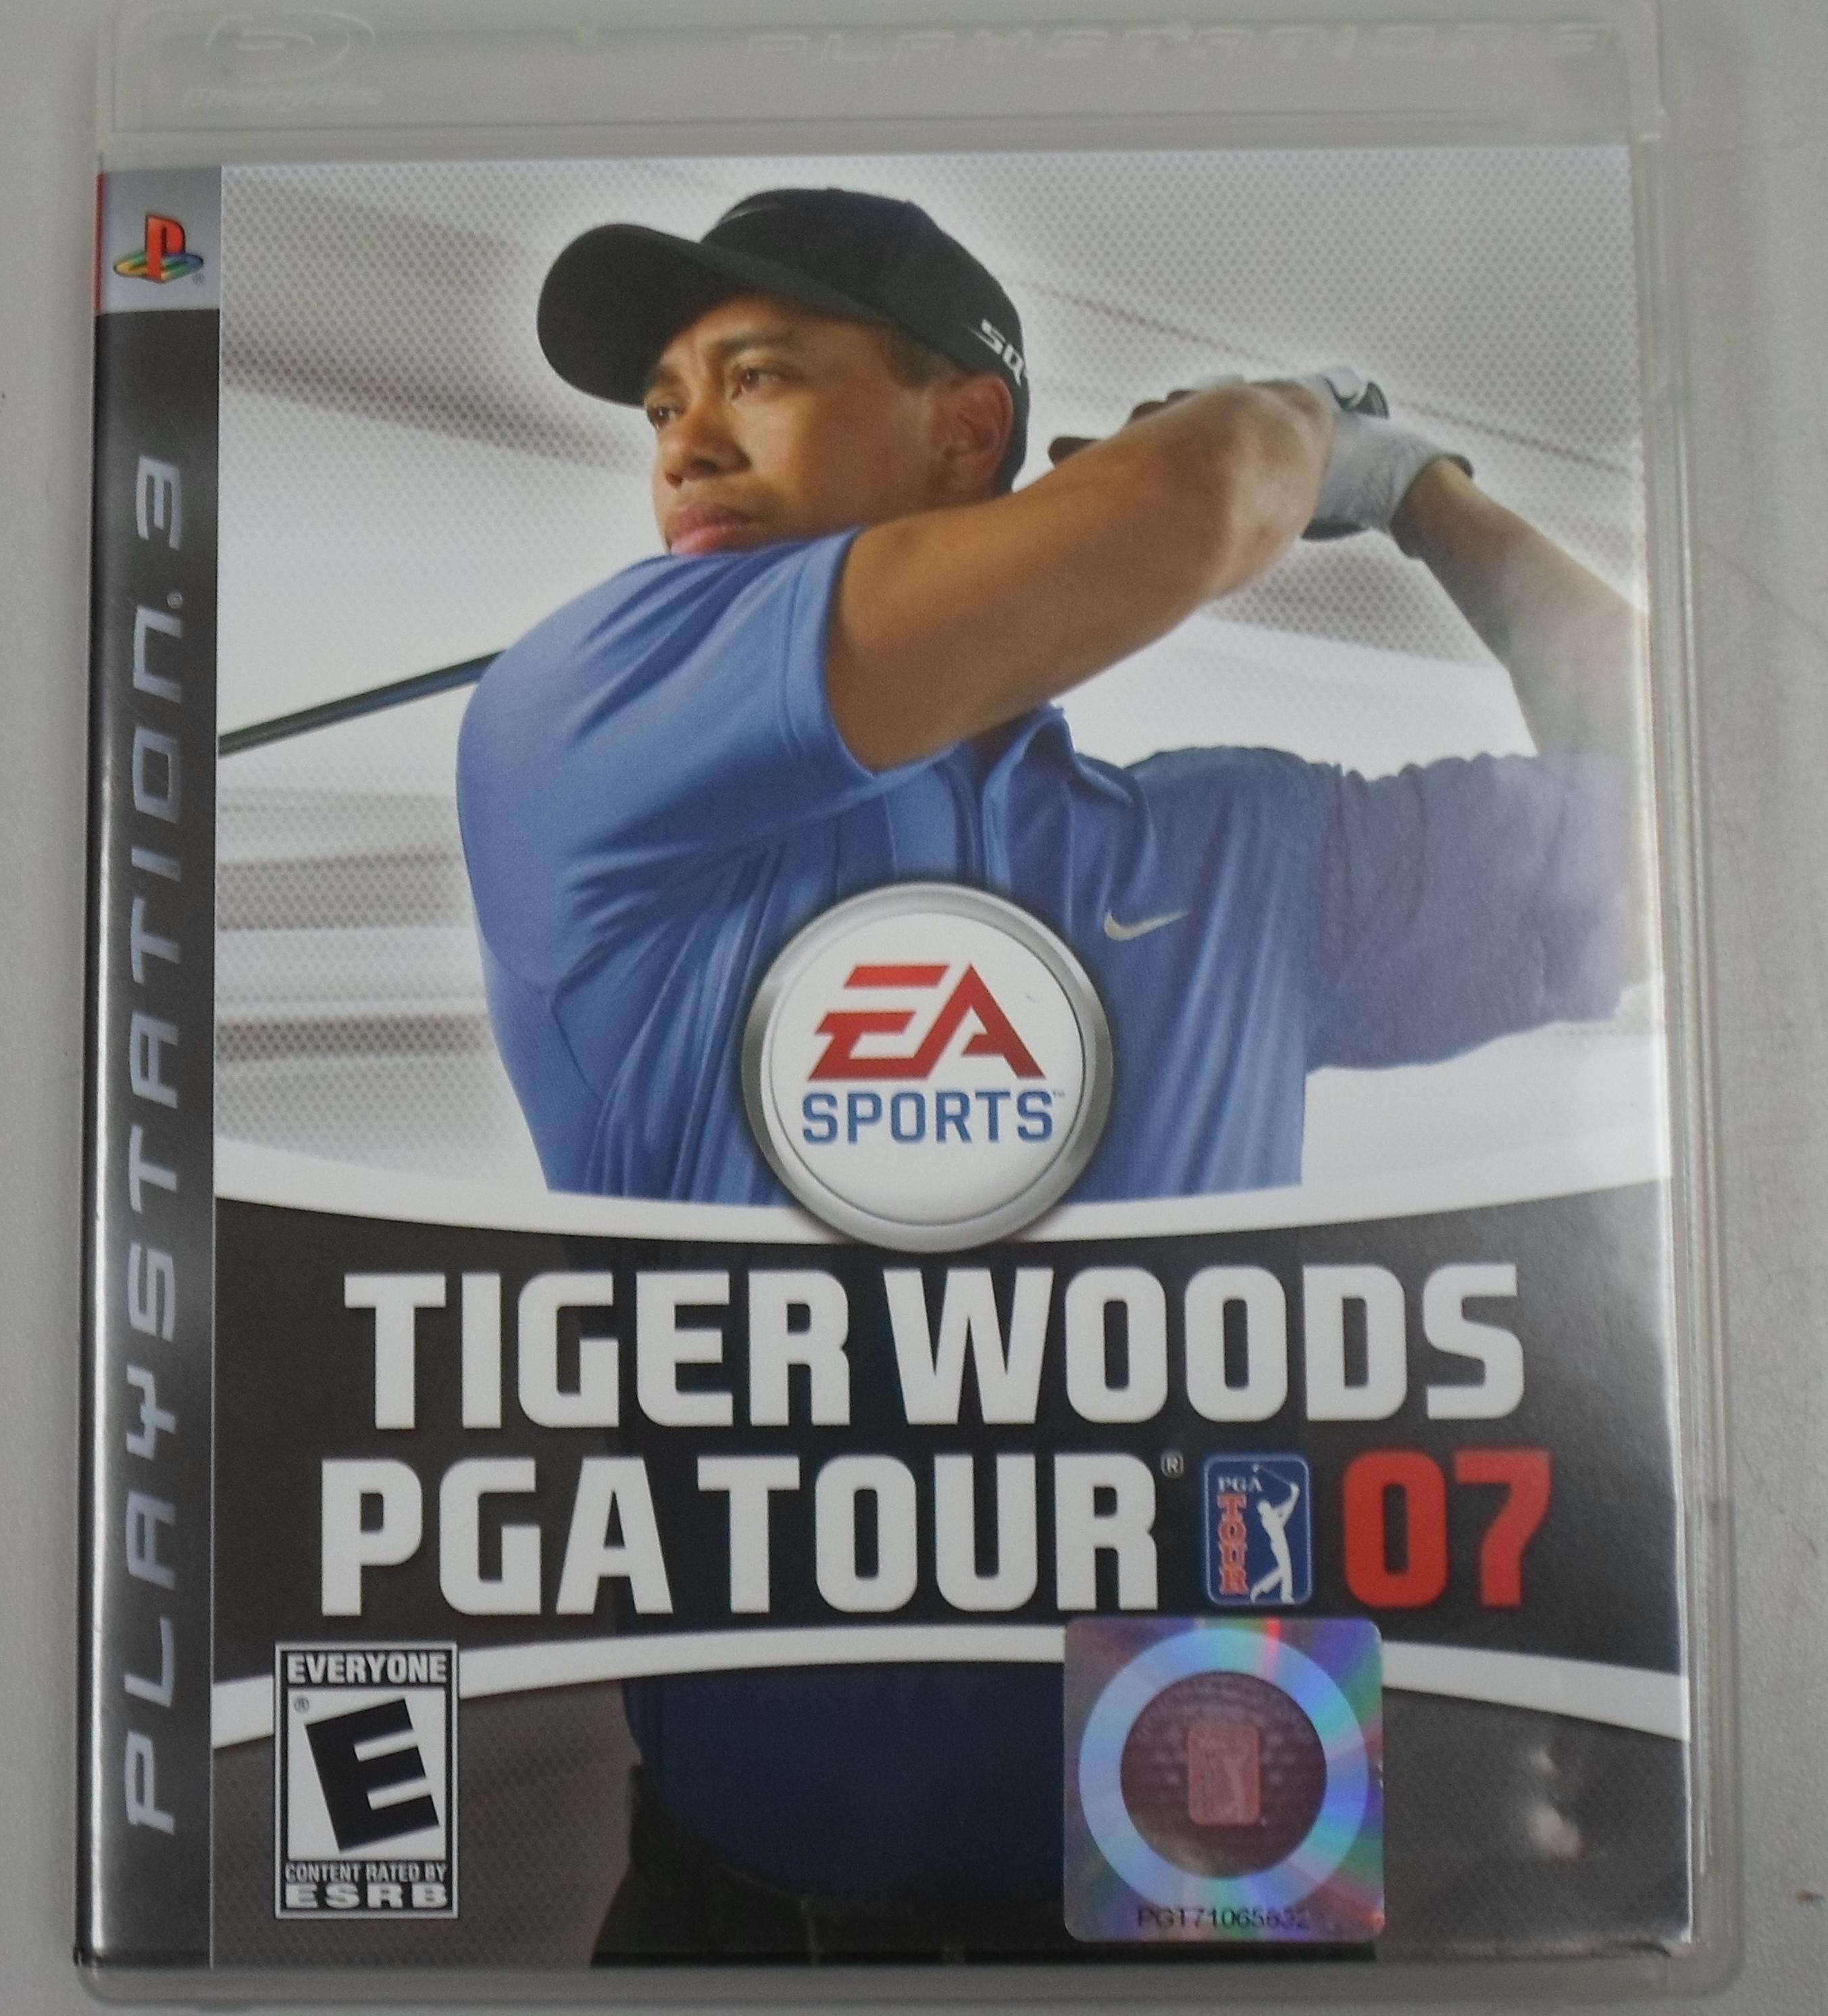 PLAYSTATION 3 GAME TIGER WOODS PGA TOUR 07